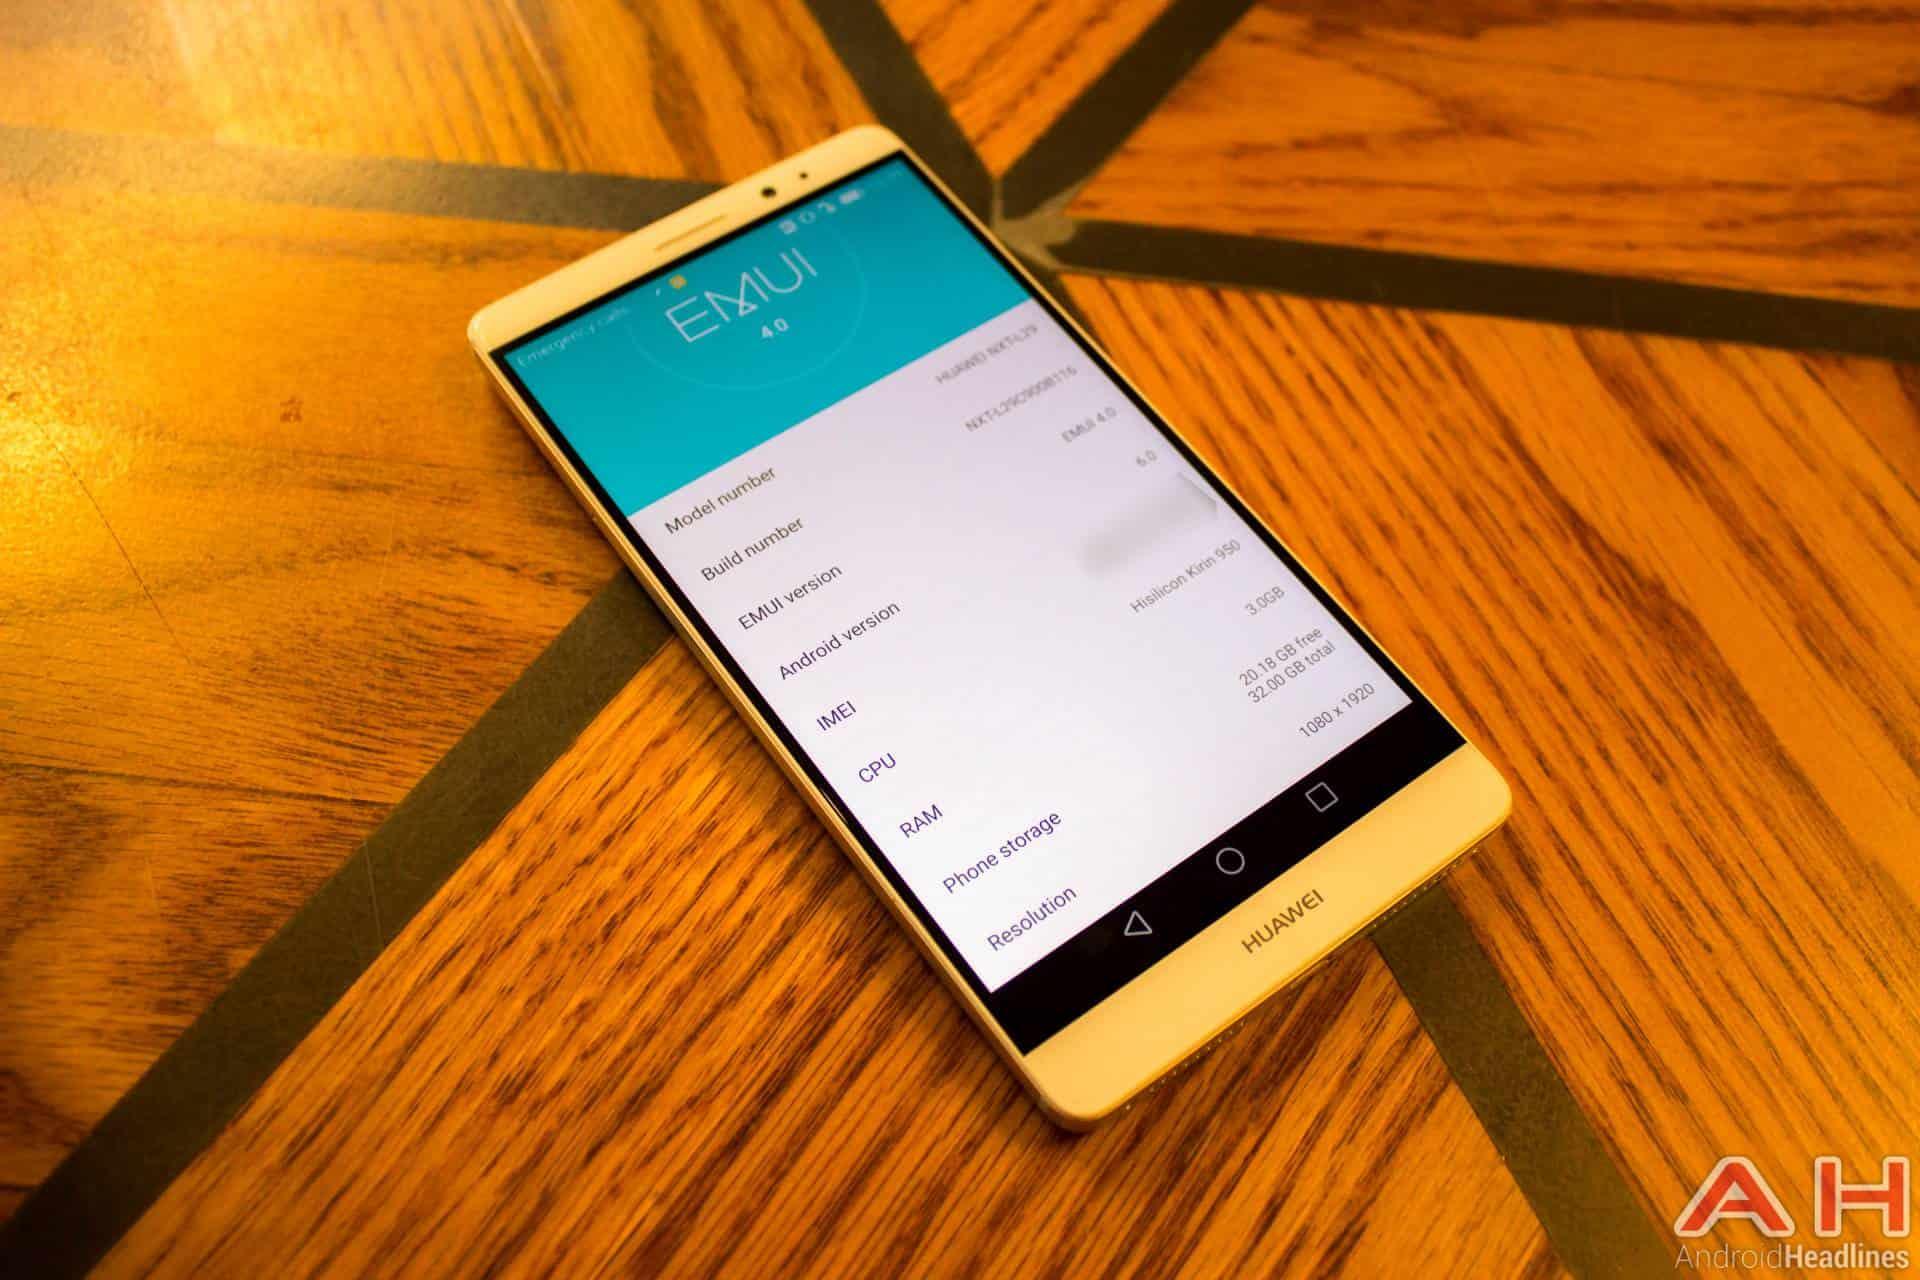 Huawei Mate 8 CES 2016 AH 6